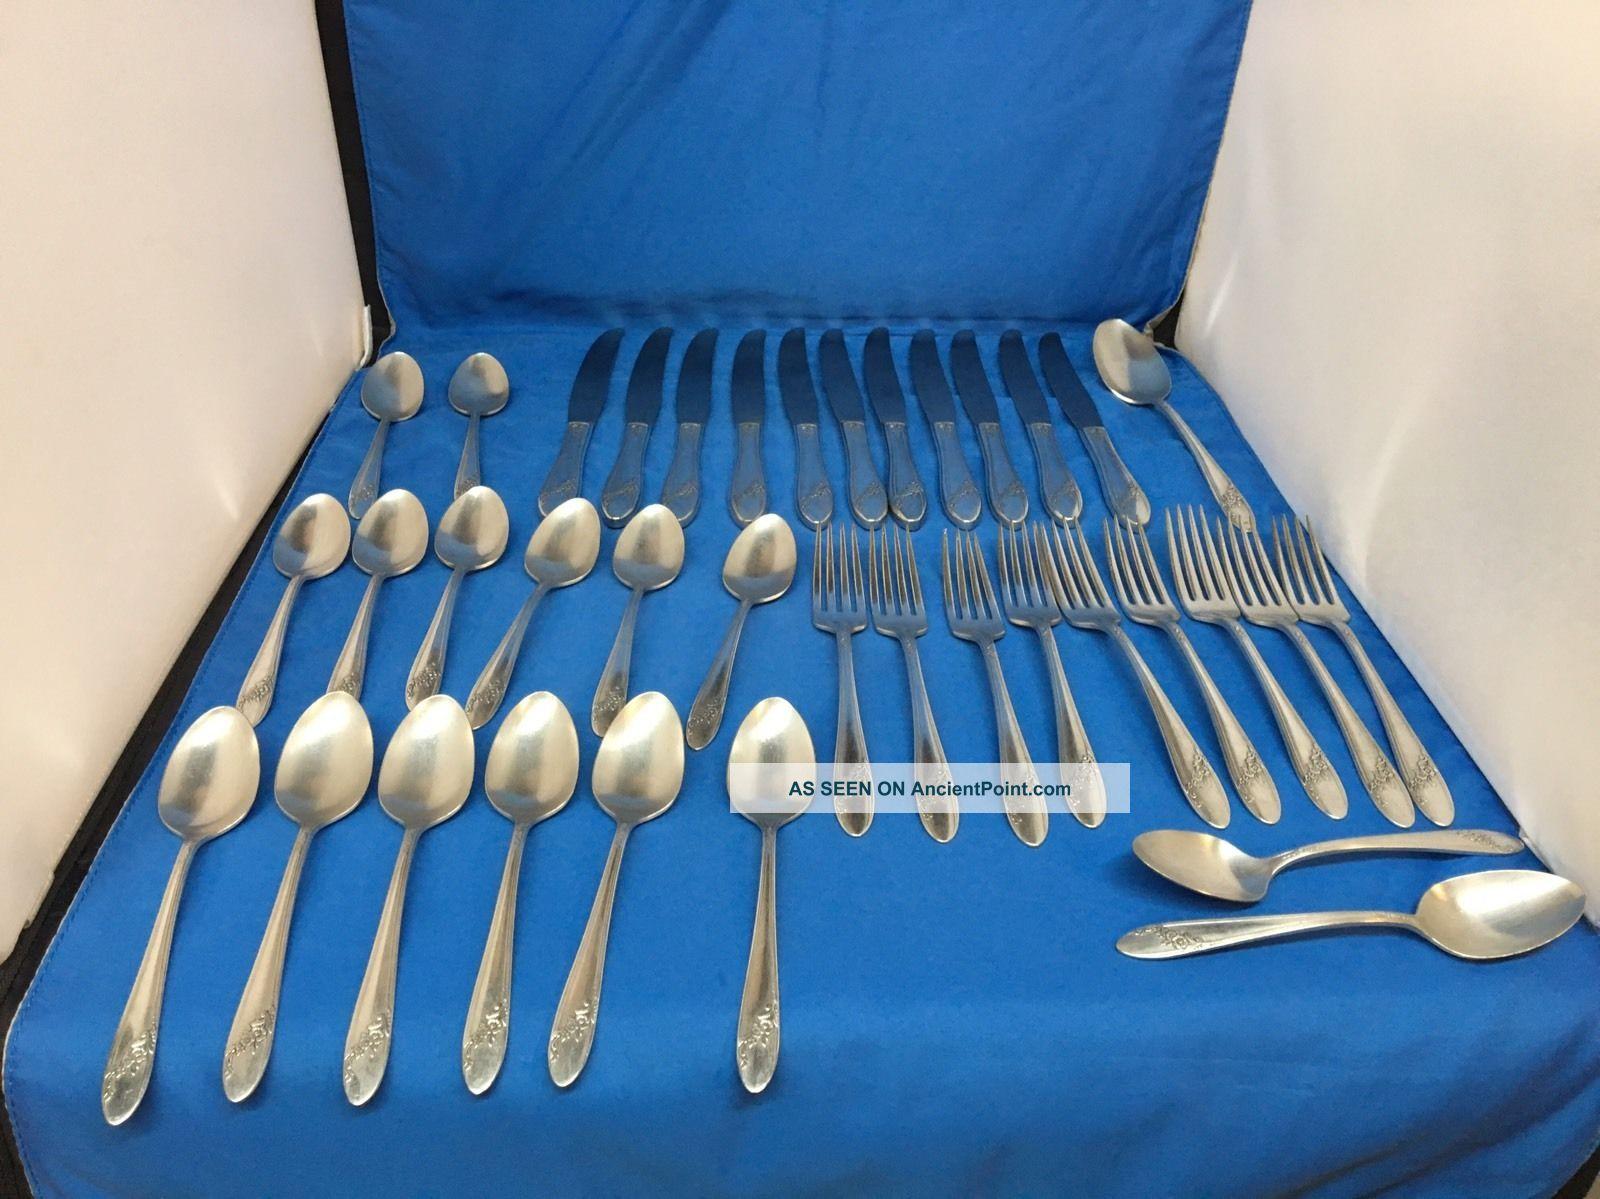 37 Vintage Tudor Plate - Oneida Community - Queen Bess - Silverplate - Silverware Flatware & Silverware photo